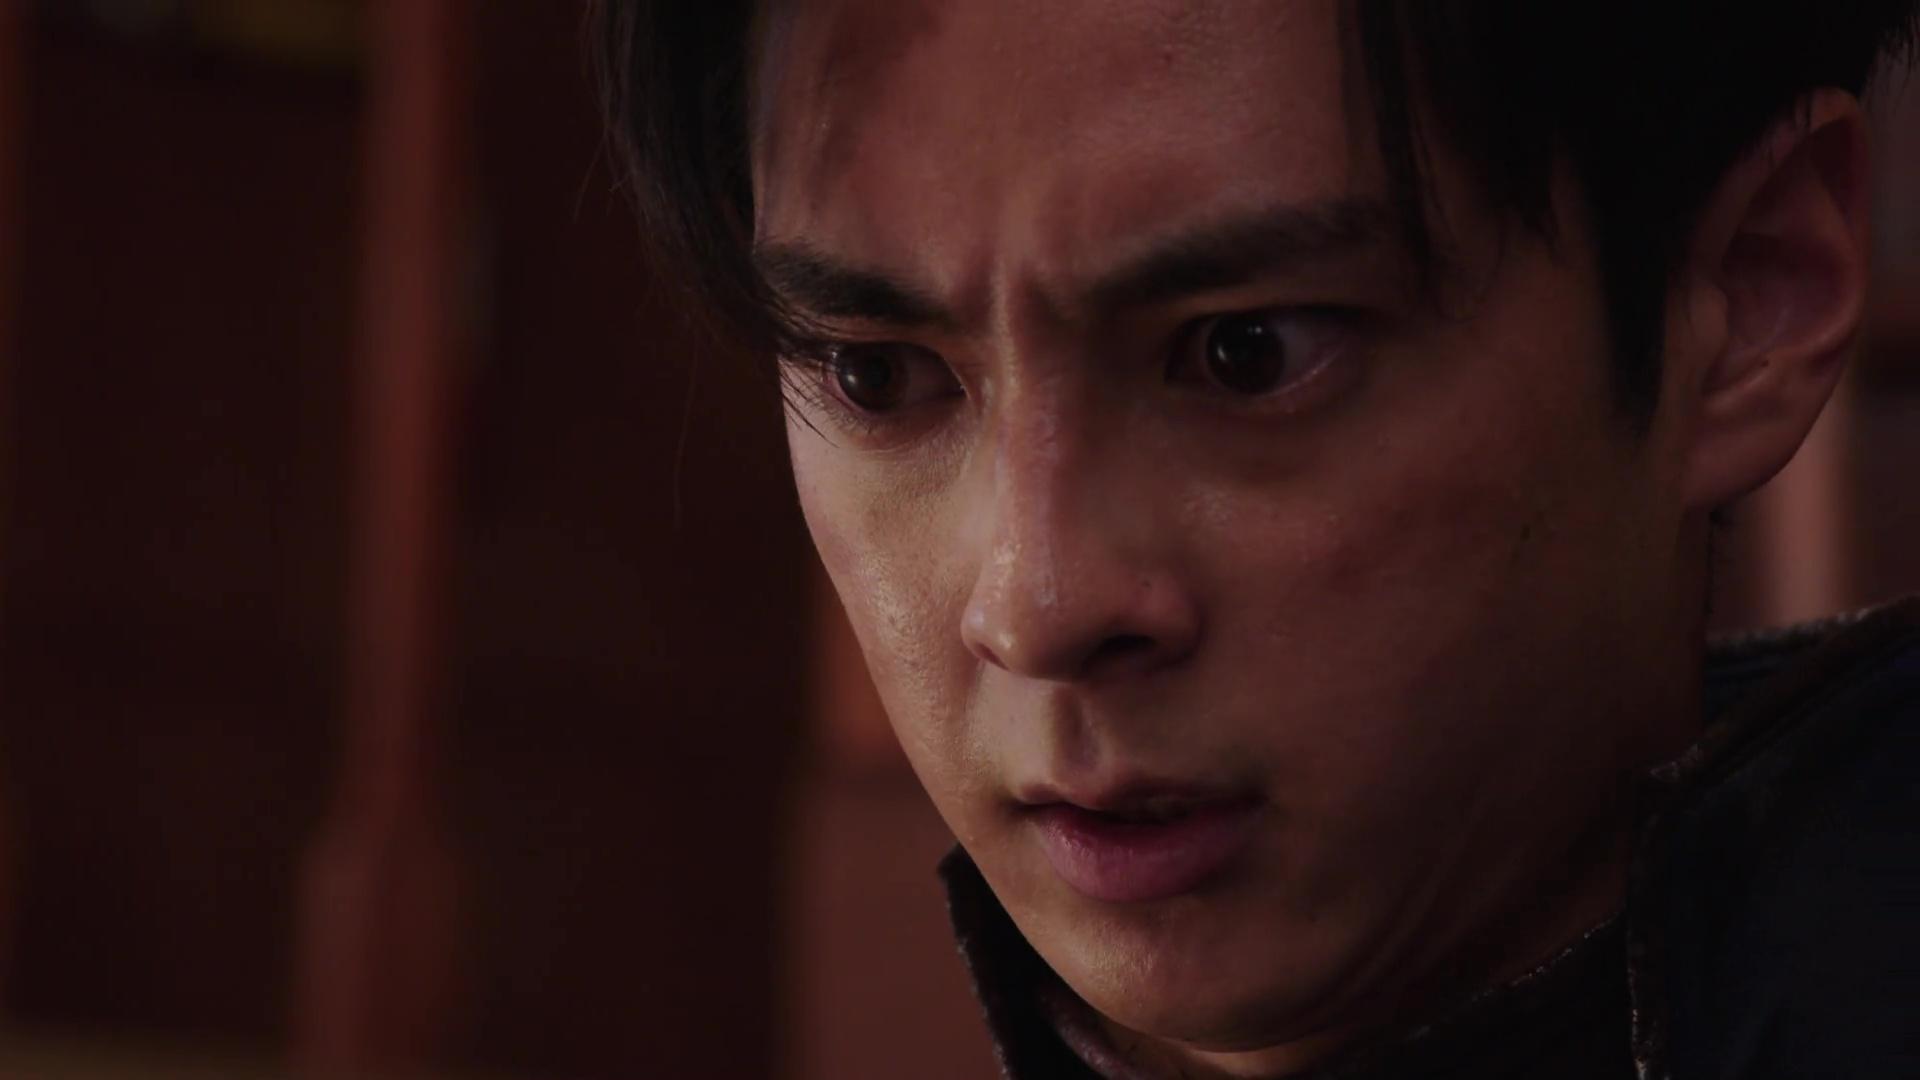 Kamen Rider Saber Episode 6 Recap